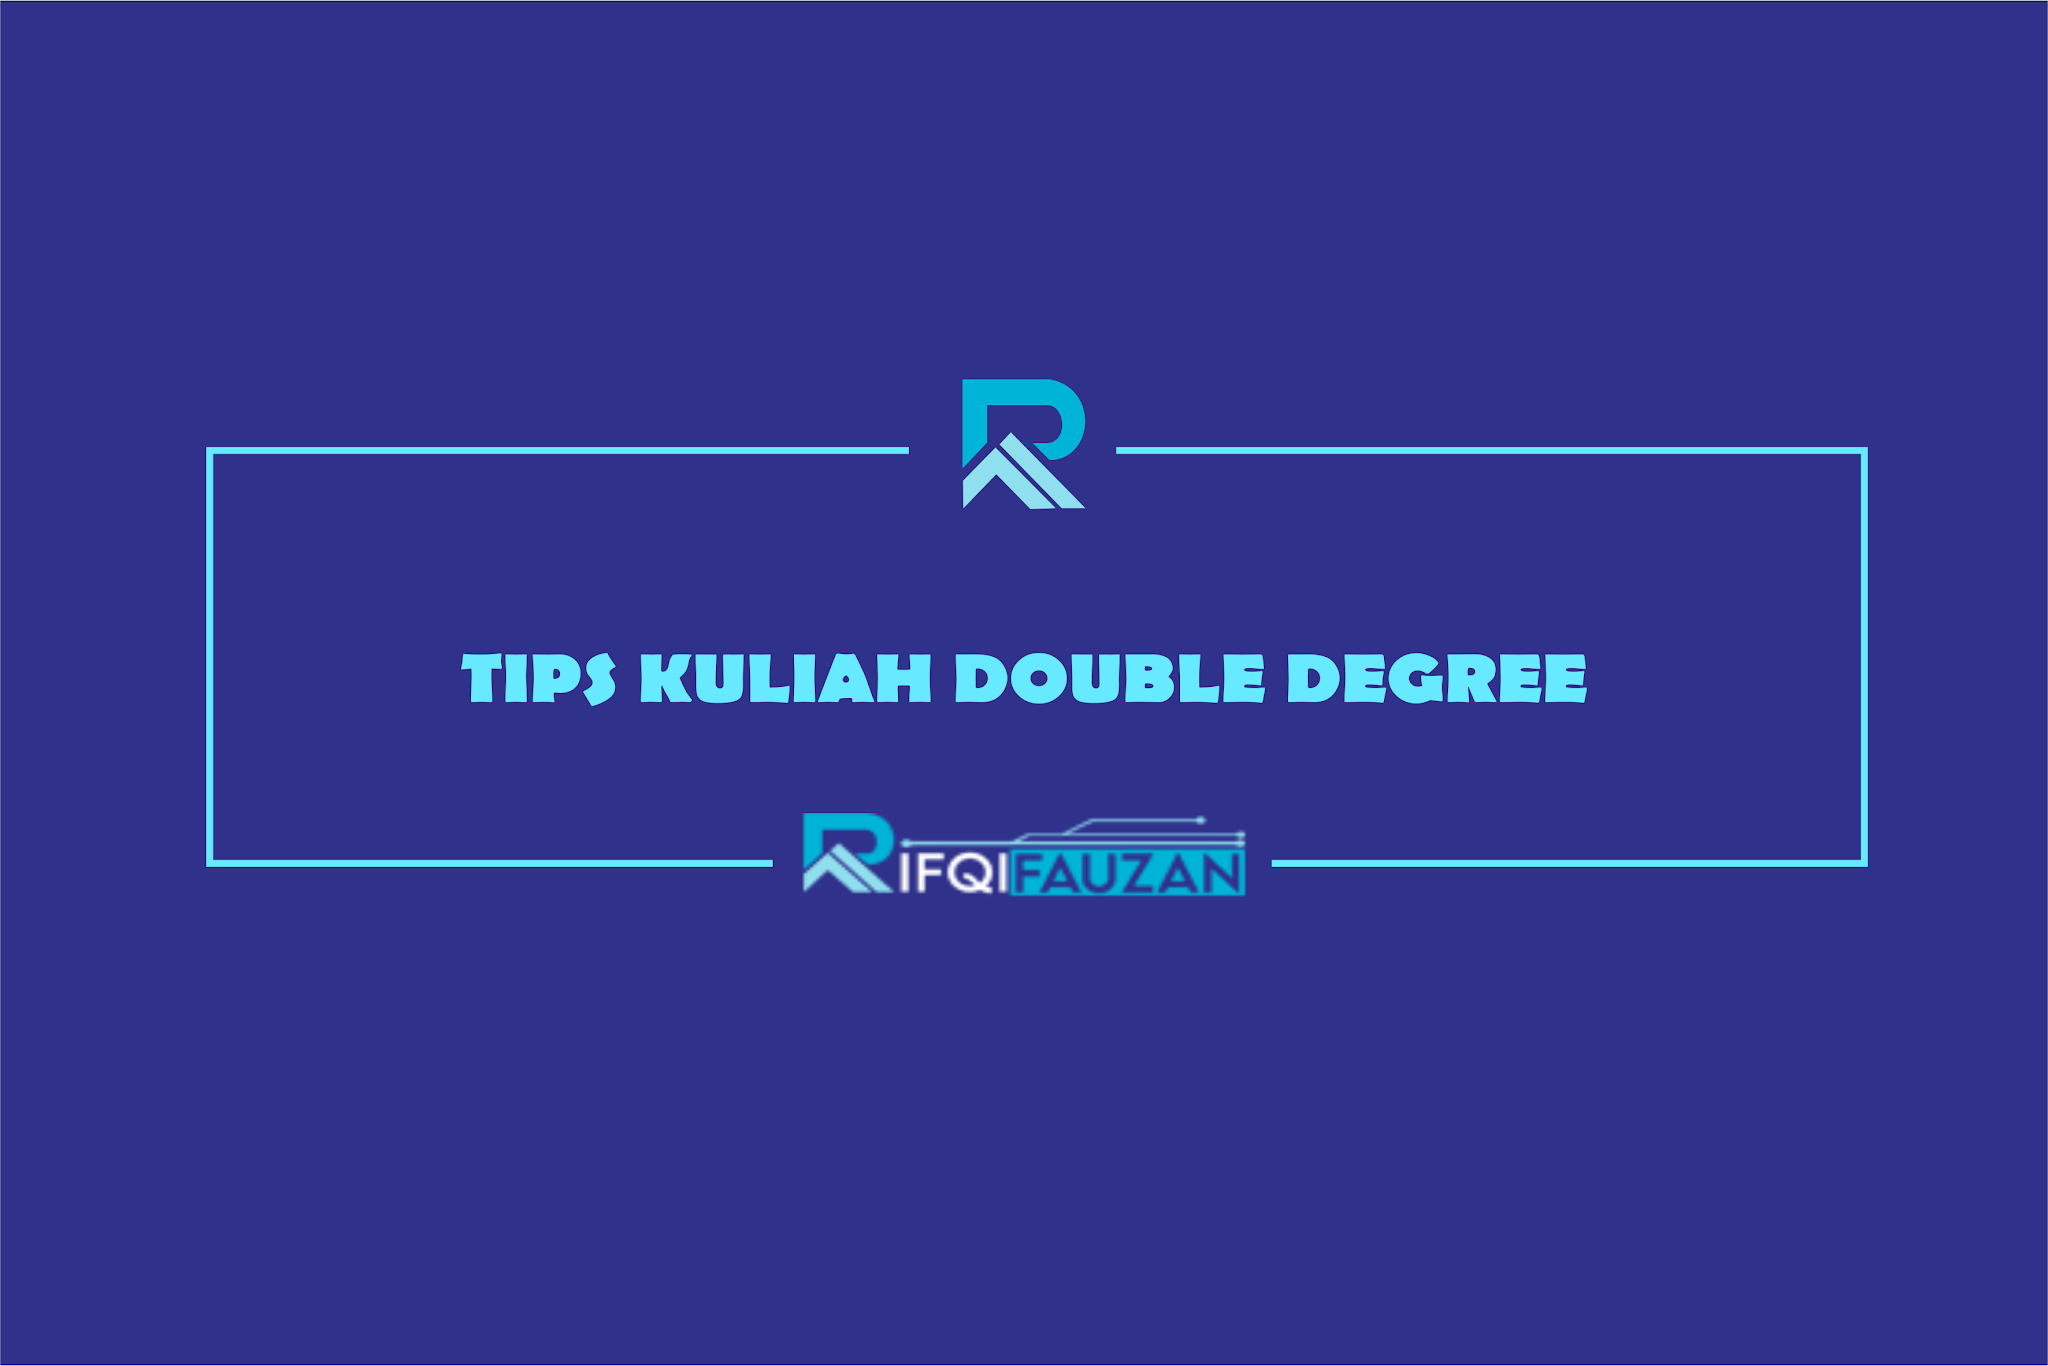 MENGAMBIL KULIAH DOUBLE DEGREE? ANDA HARUS LAKUKAN TIPS-TIPS BERIKUT INI